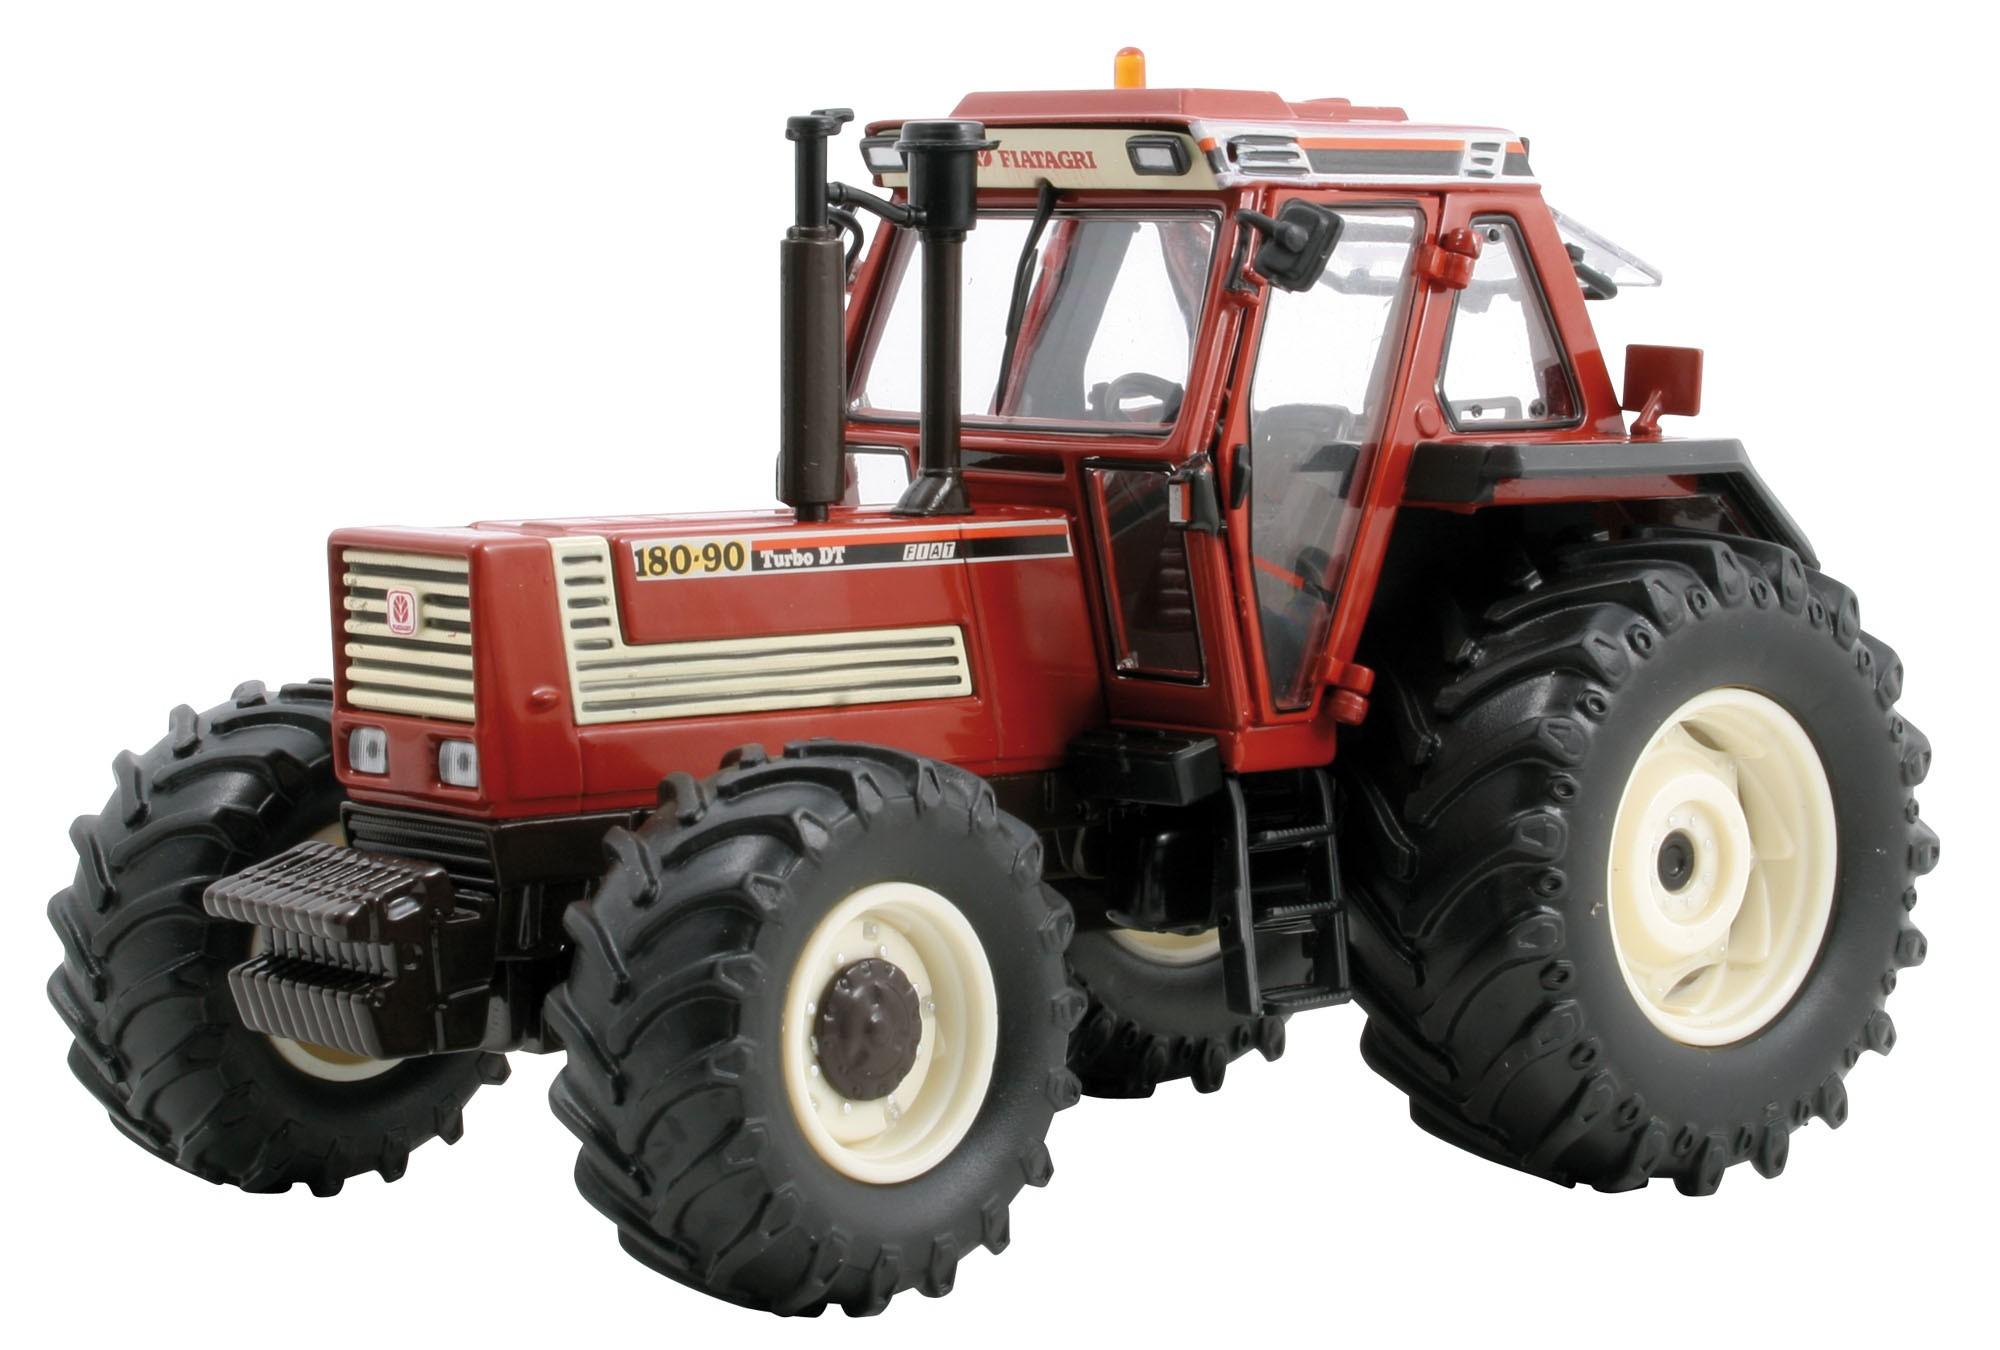 Dessin Coloriage Tracteur Agricole